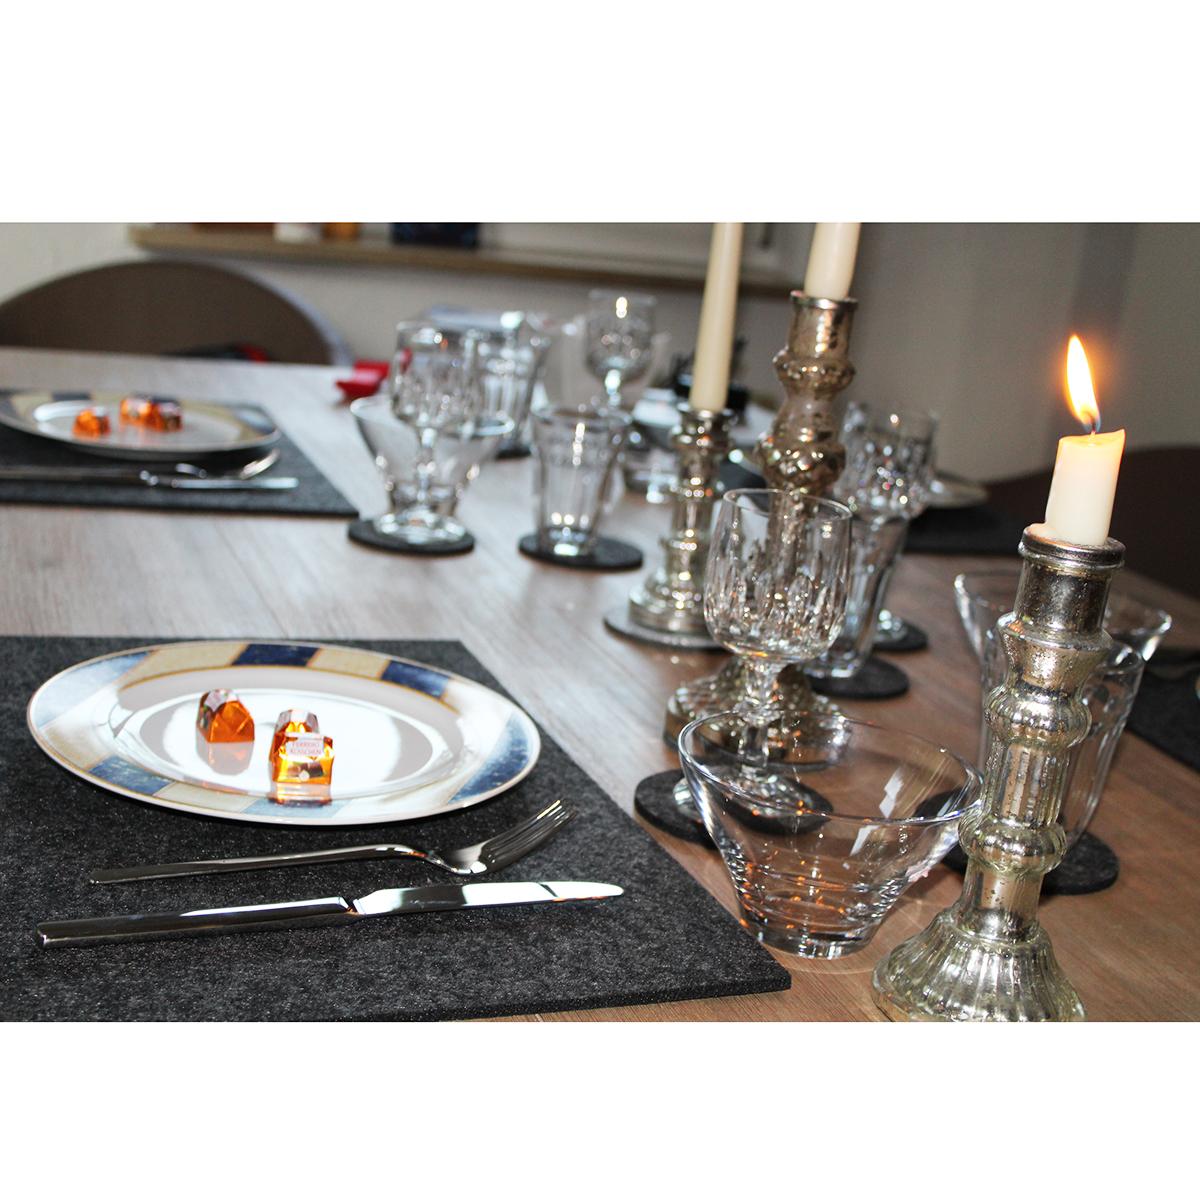 4 x tischsets aus filz dunkelgrau 30 x 45 cm annastore. Black Bedroom Furniture Sets. Home Design Ideas